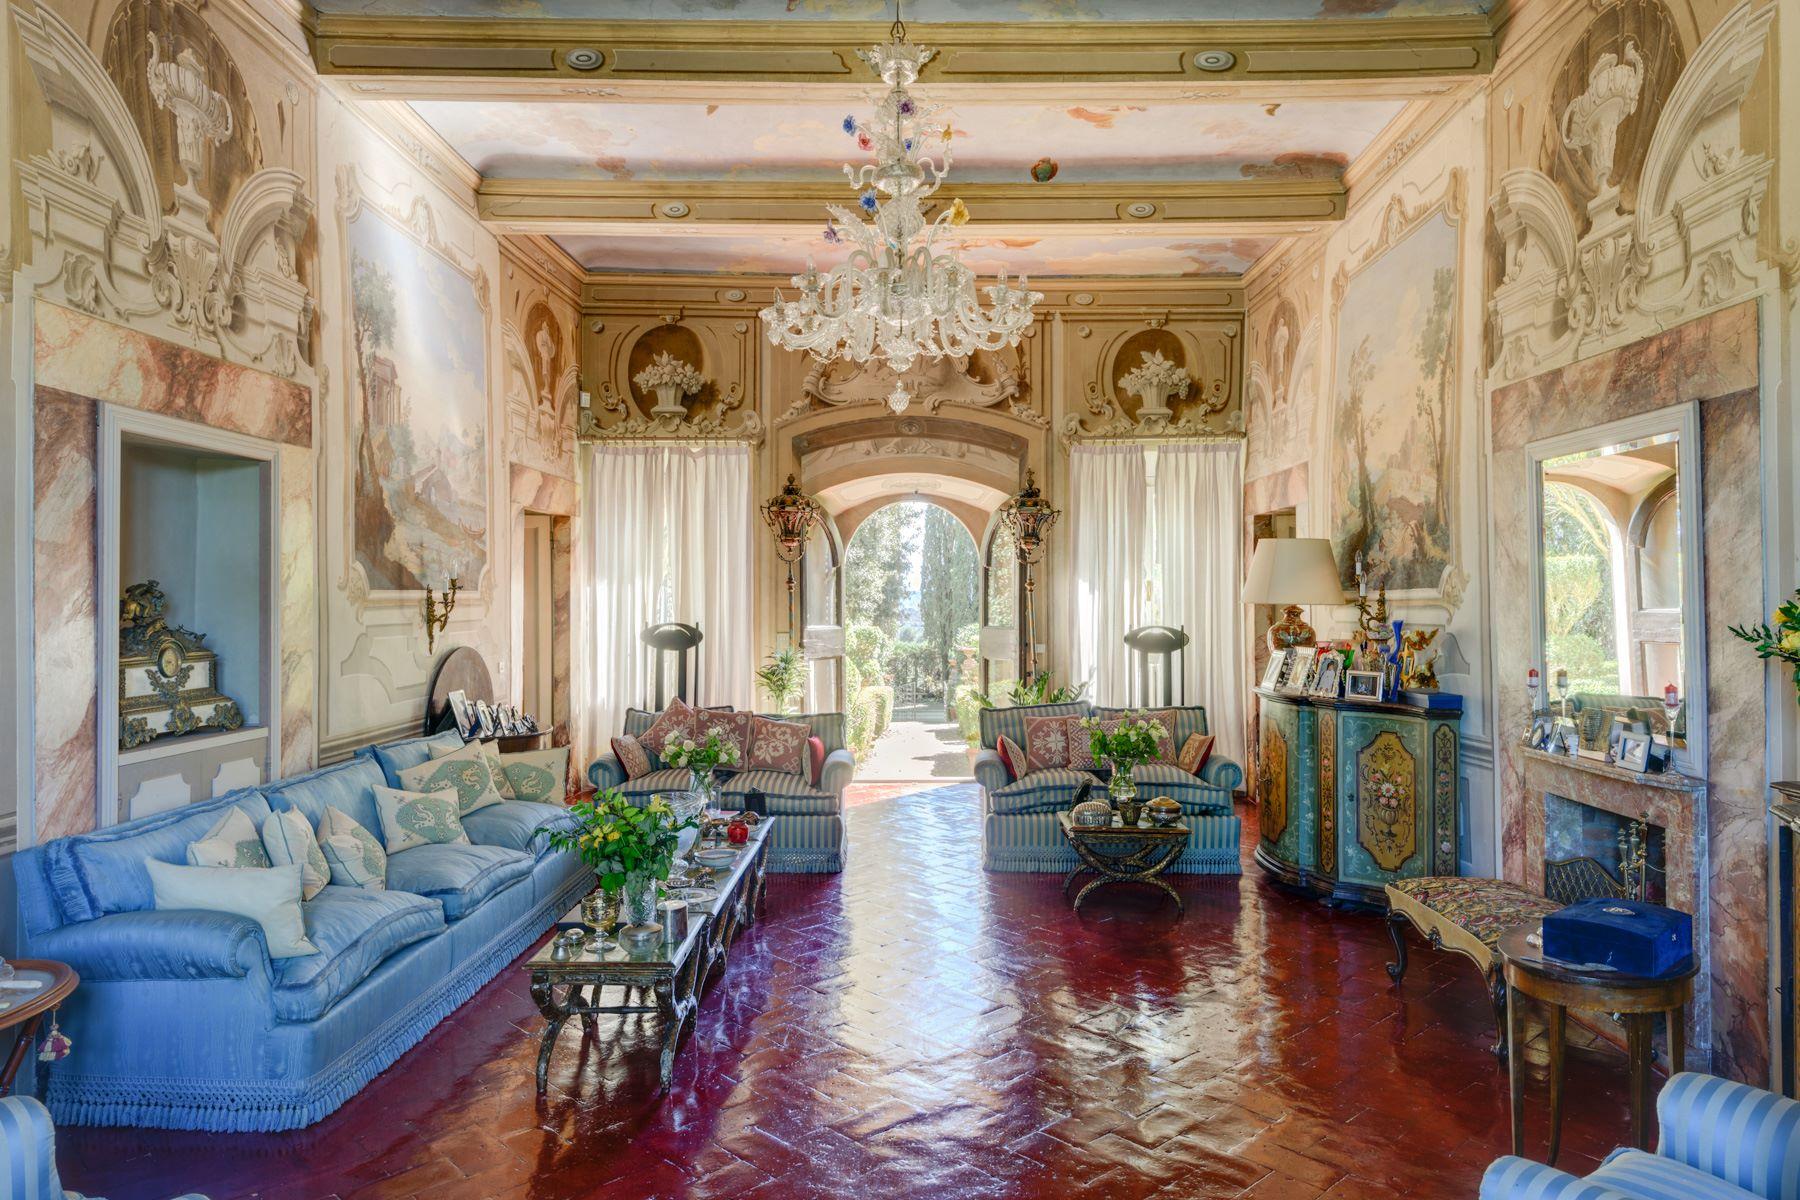 Single Family Home for Sale at Michelangelesque Villa near Florence San Casciano in Val di Pesa San Casciano In Val Di Pesa, Florence 50026 Italy